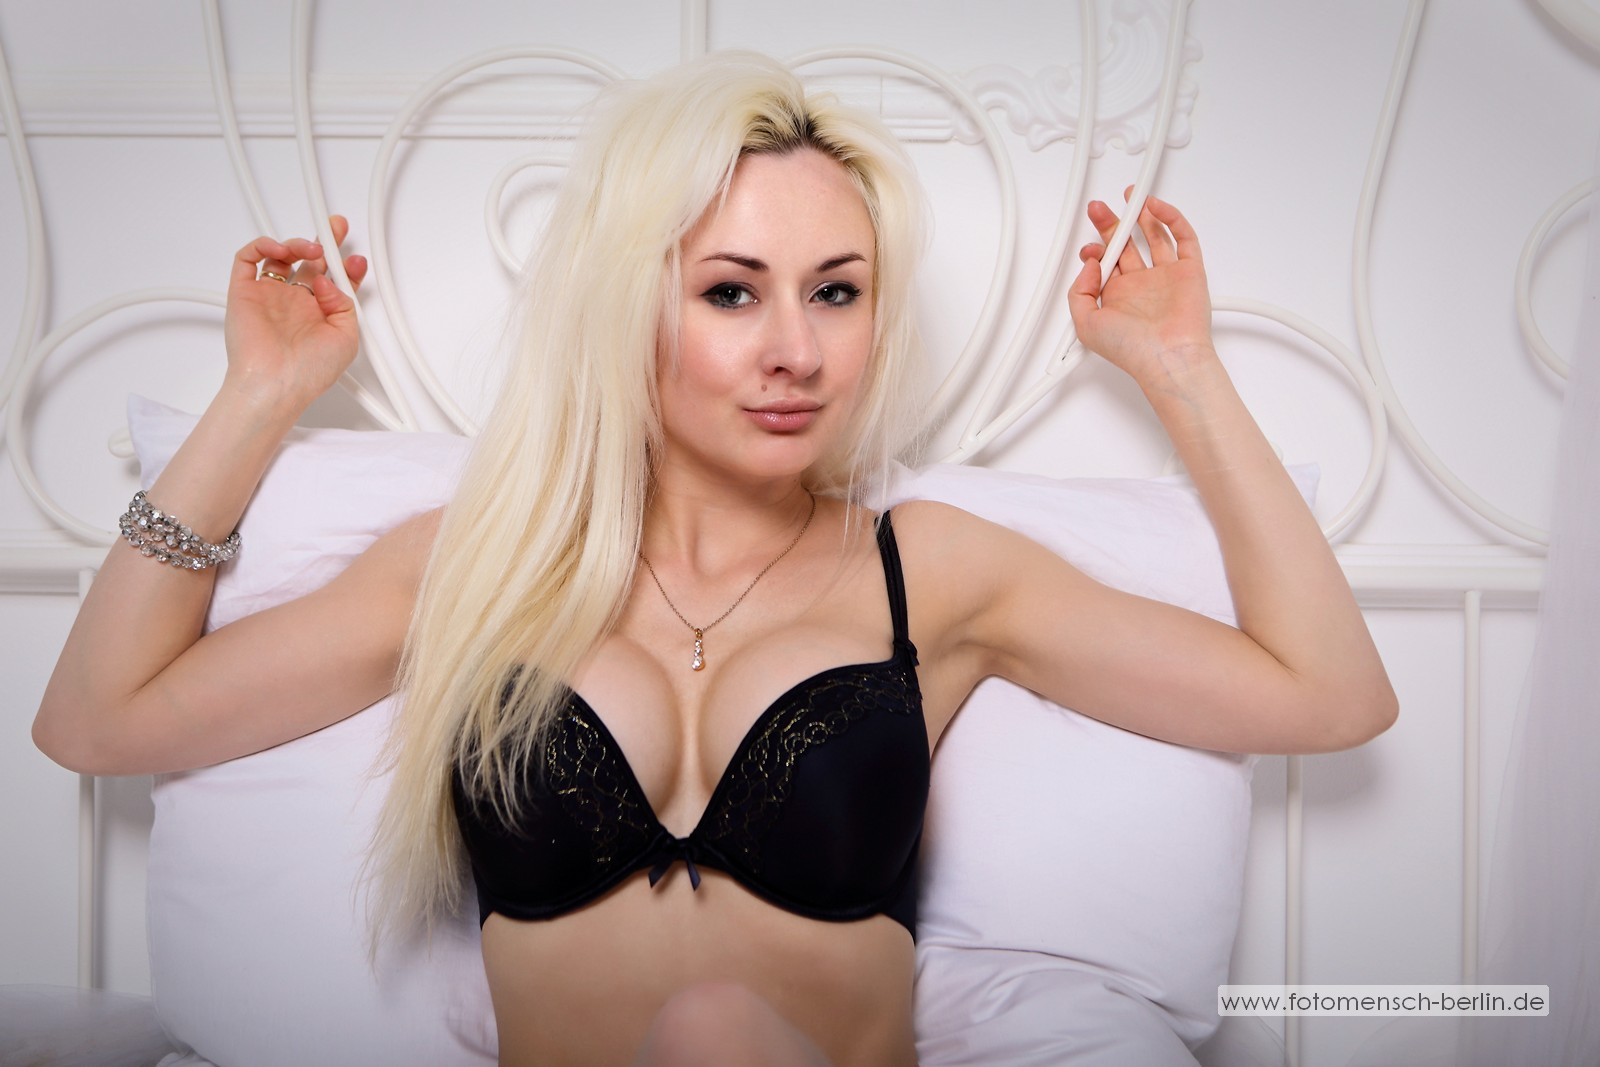 Olga im Bett in schwarz